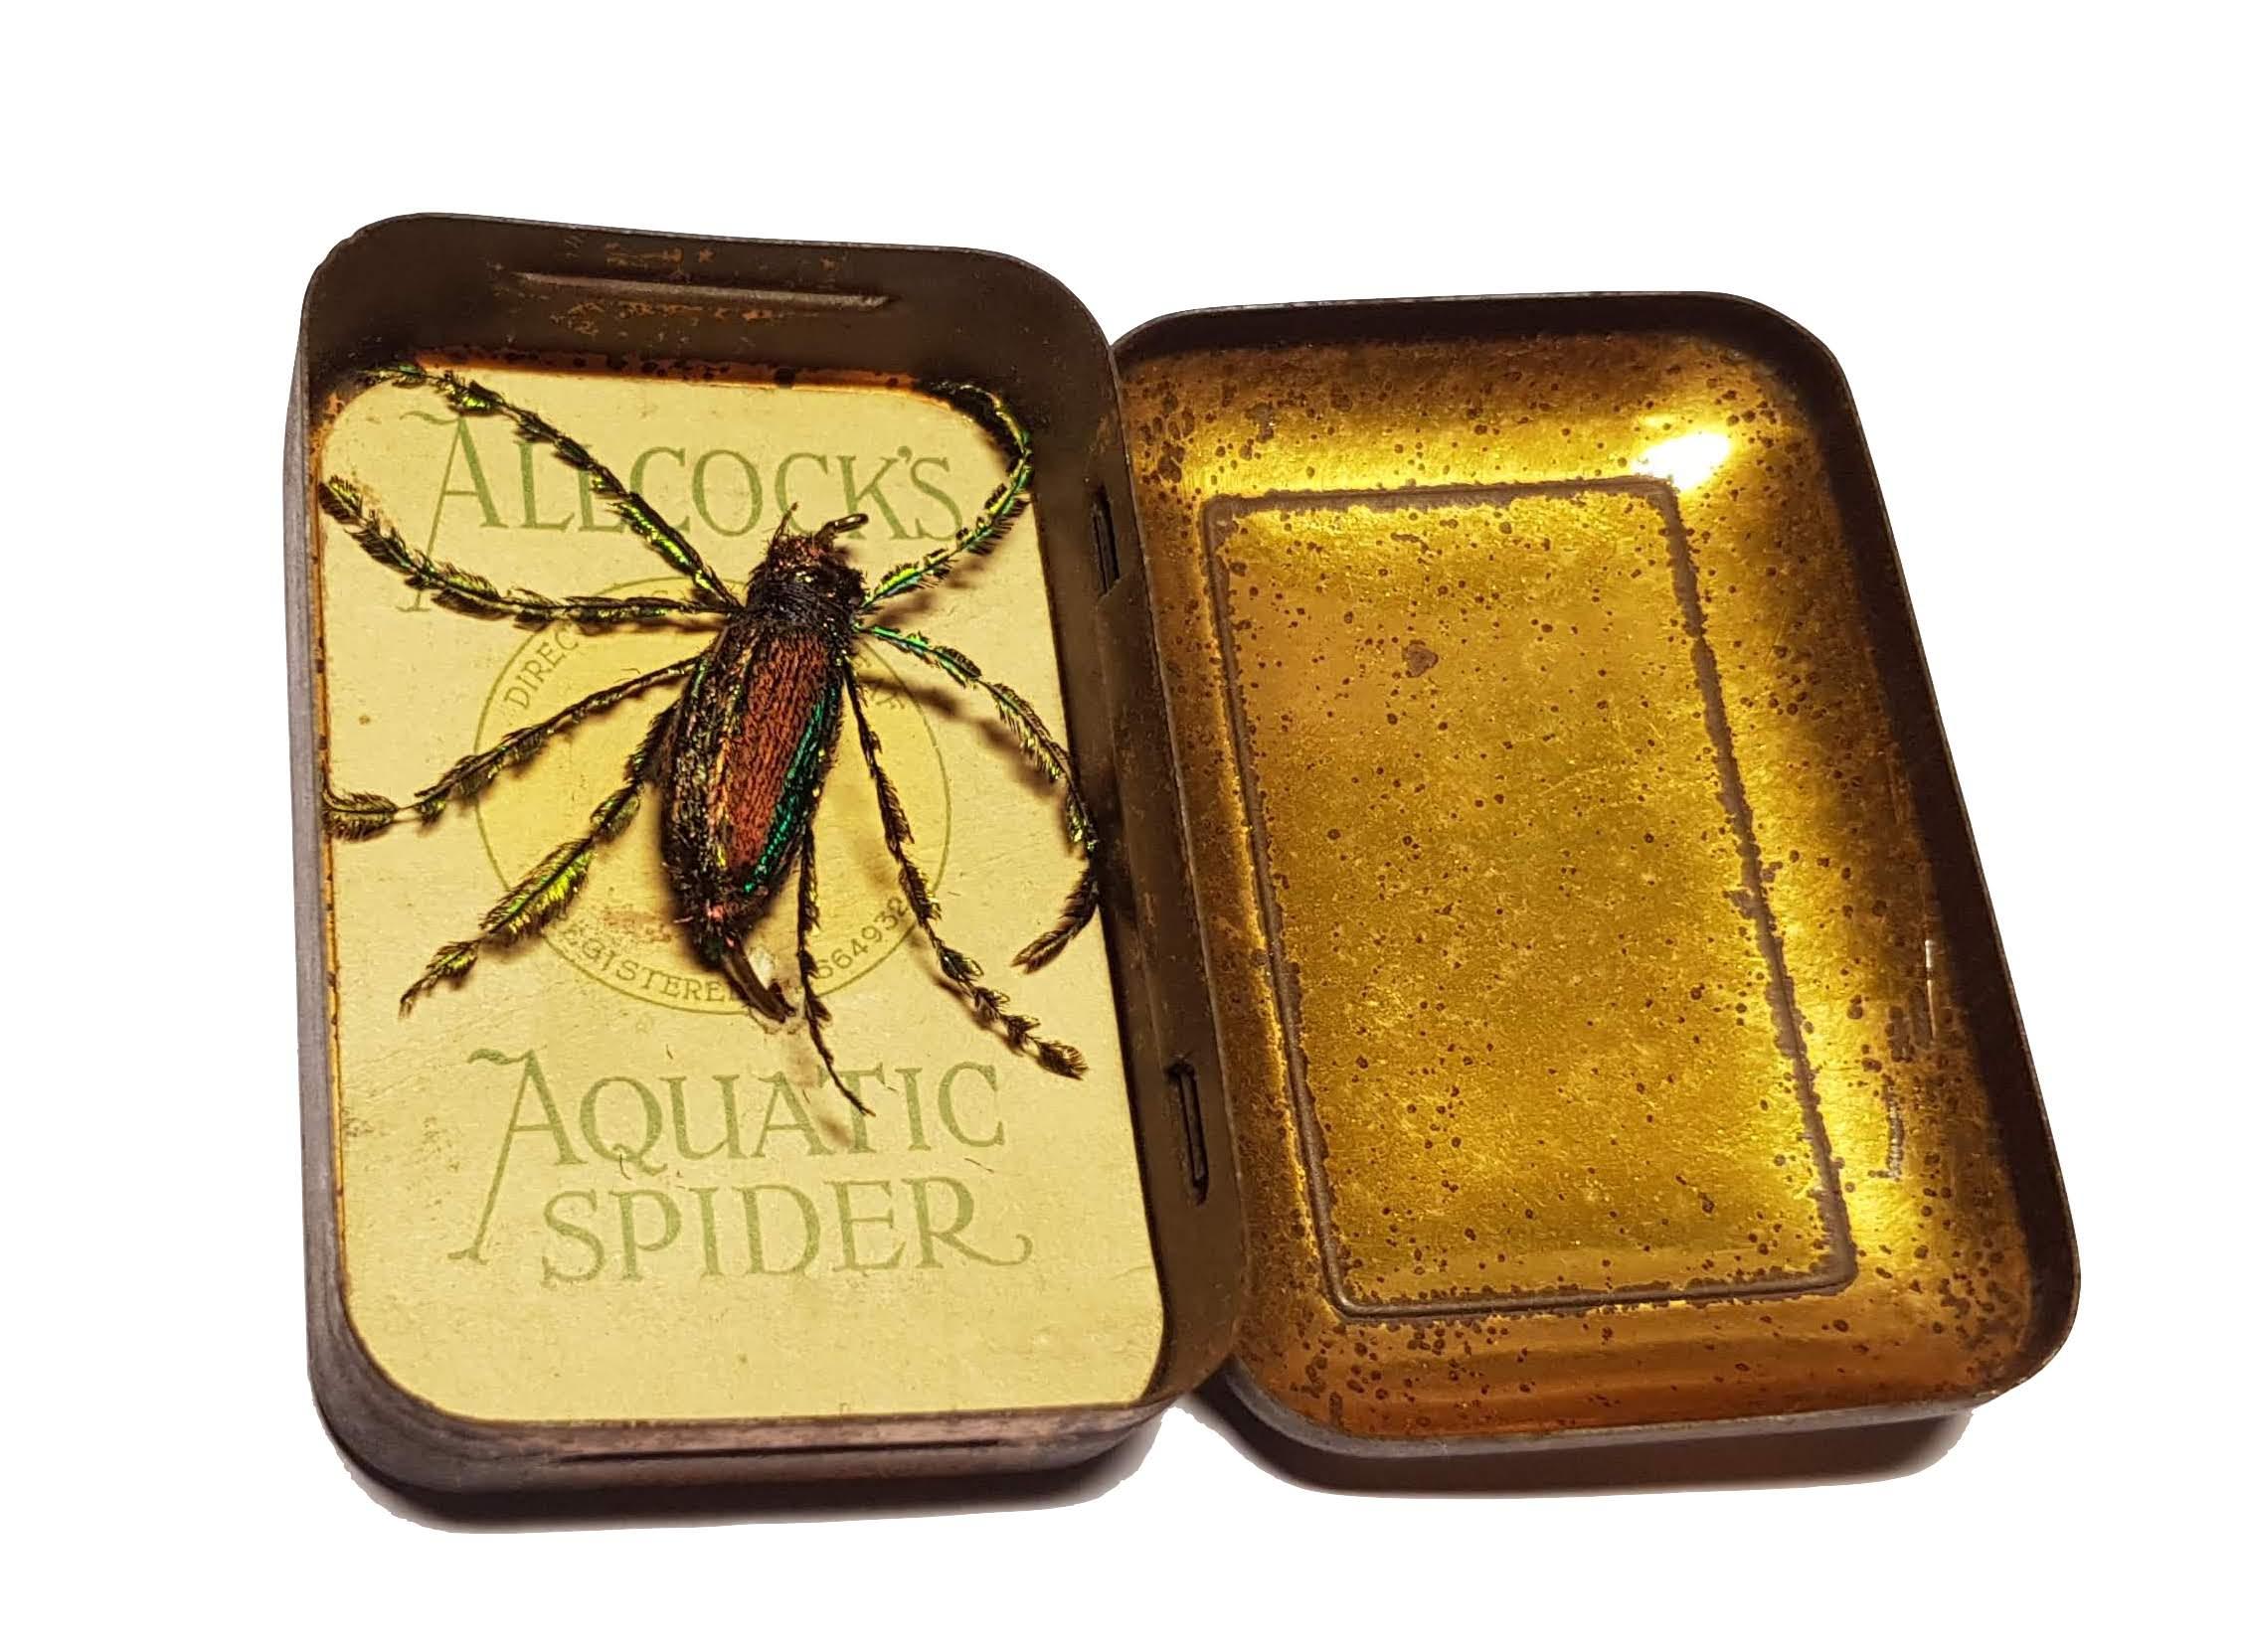 Allcock's Aquatic Spider